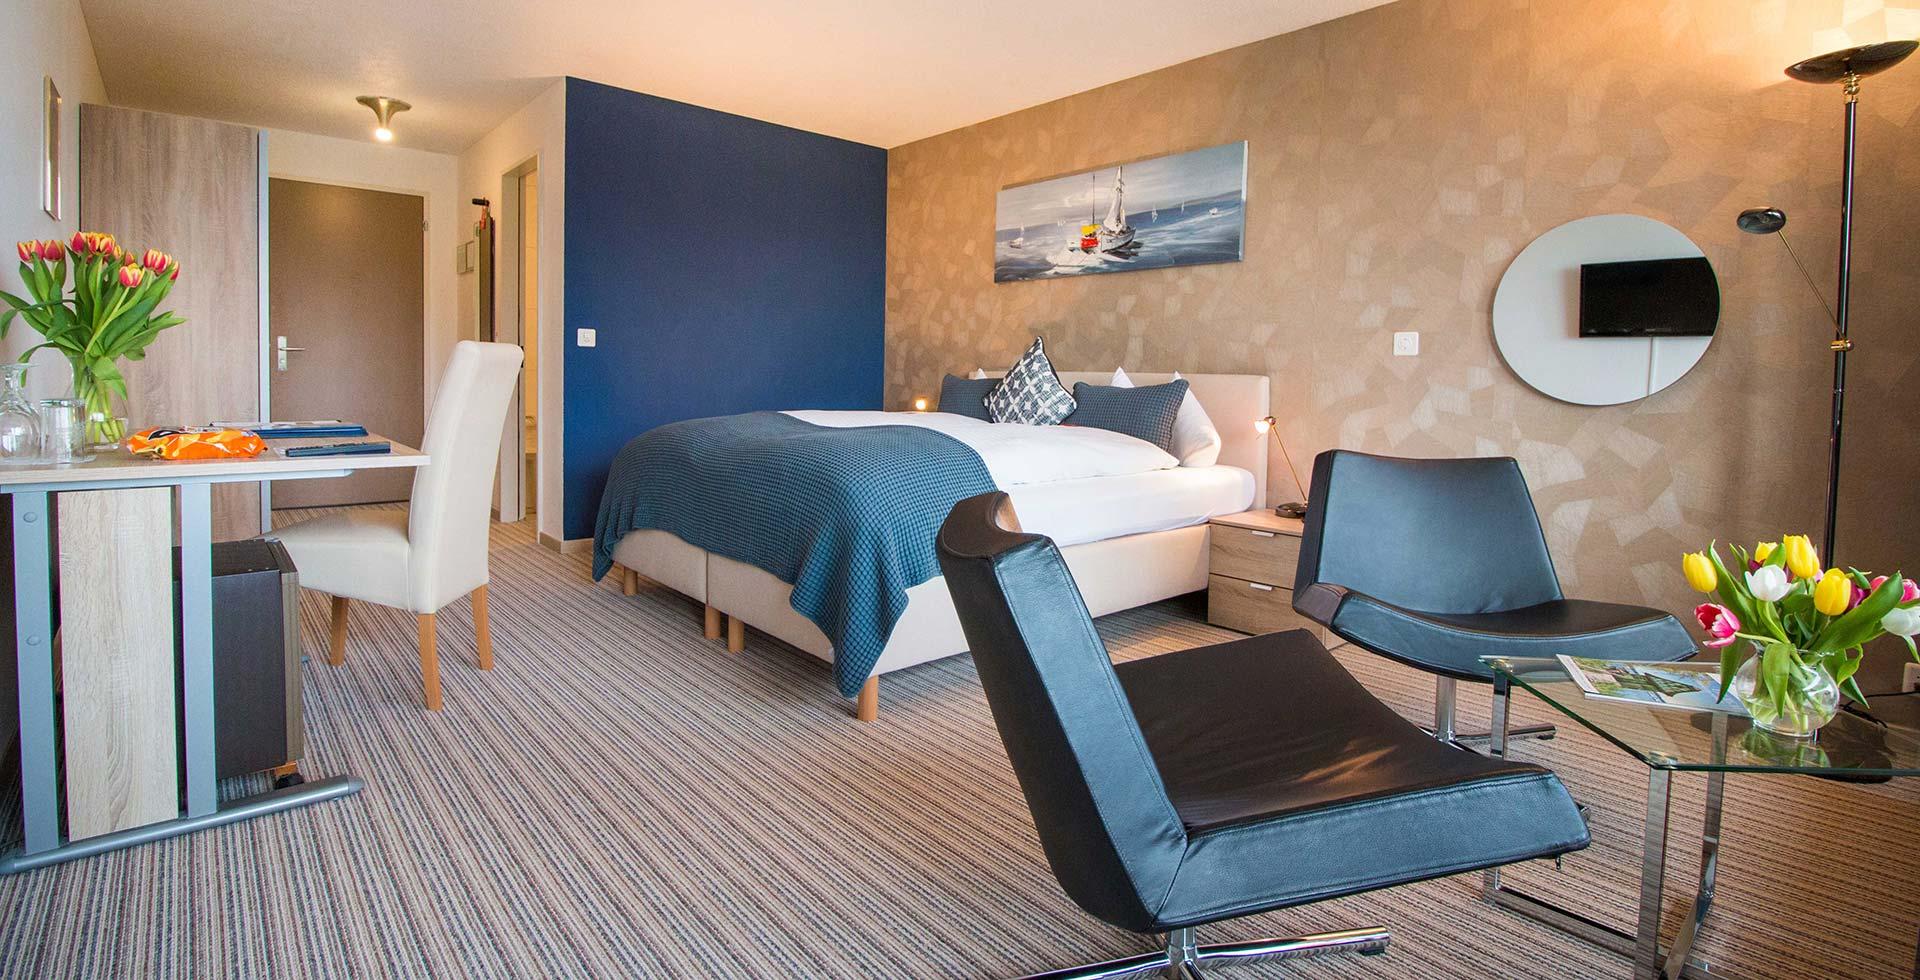 Slide Hotelzimmer-Entspannung-Park-Hotel Inseli-MG_1541-1920x980